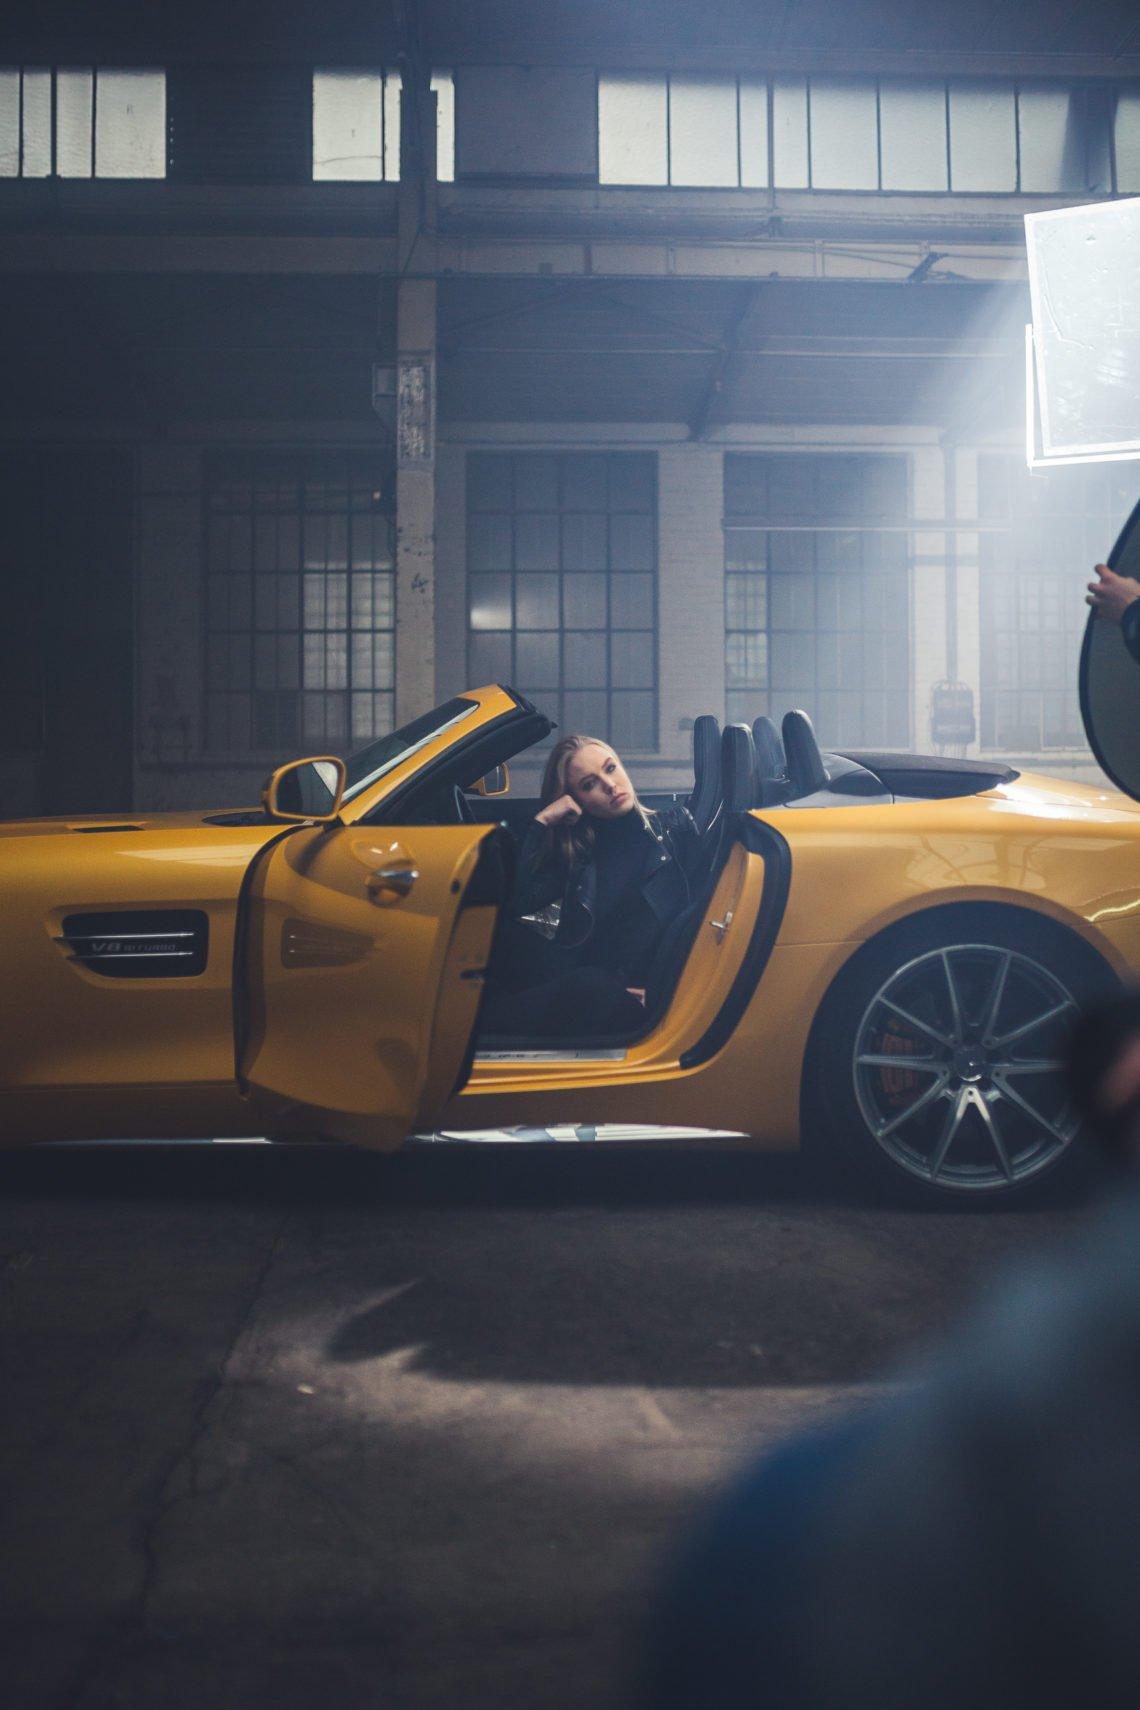 Felgen gelb Gesicht Frau Auto